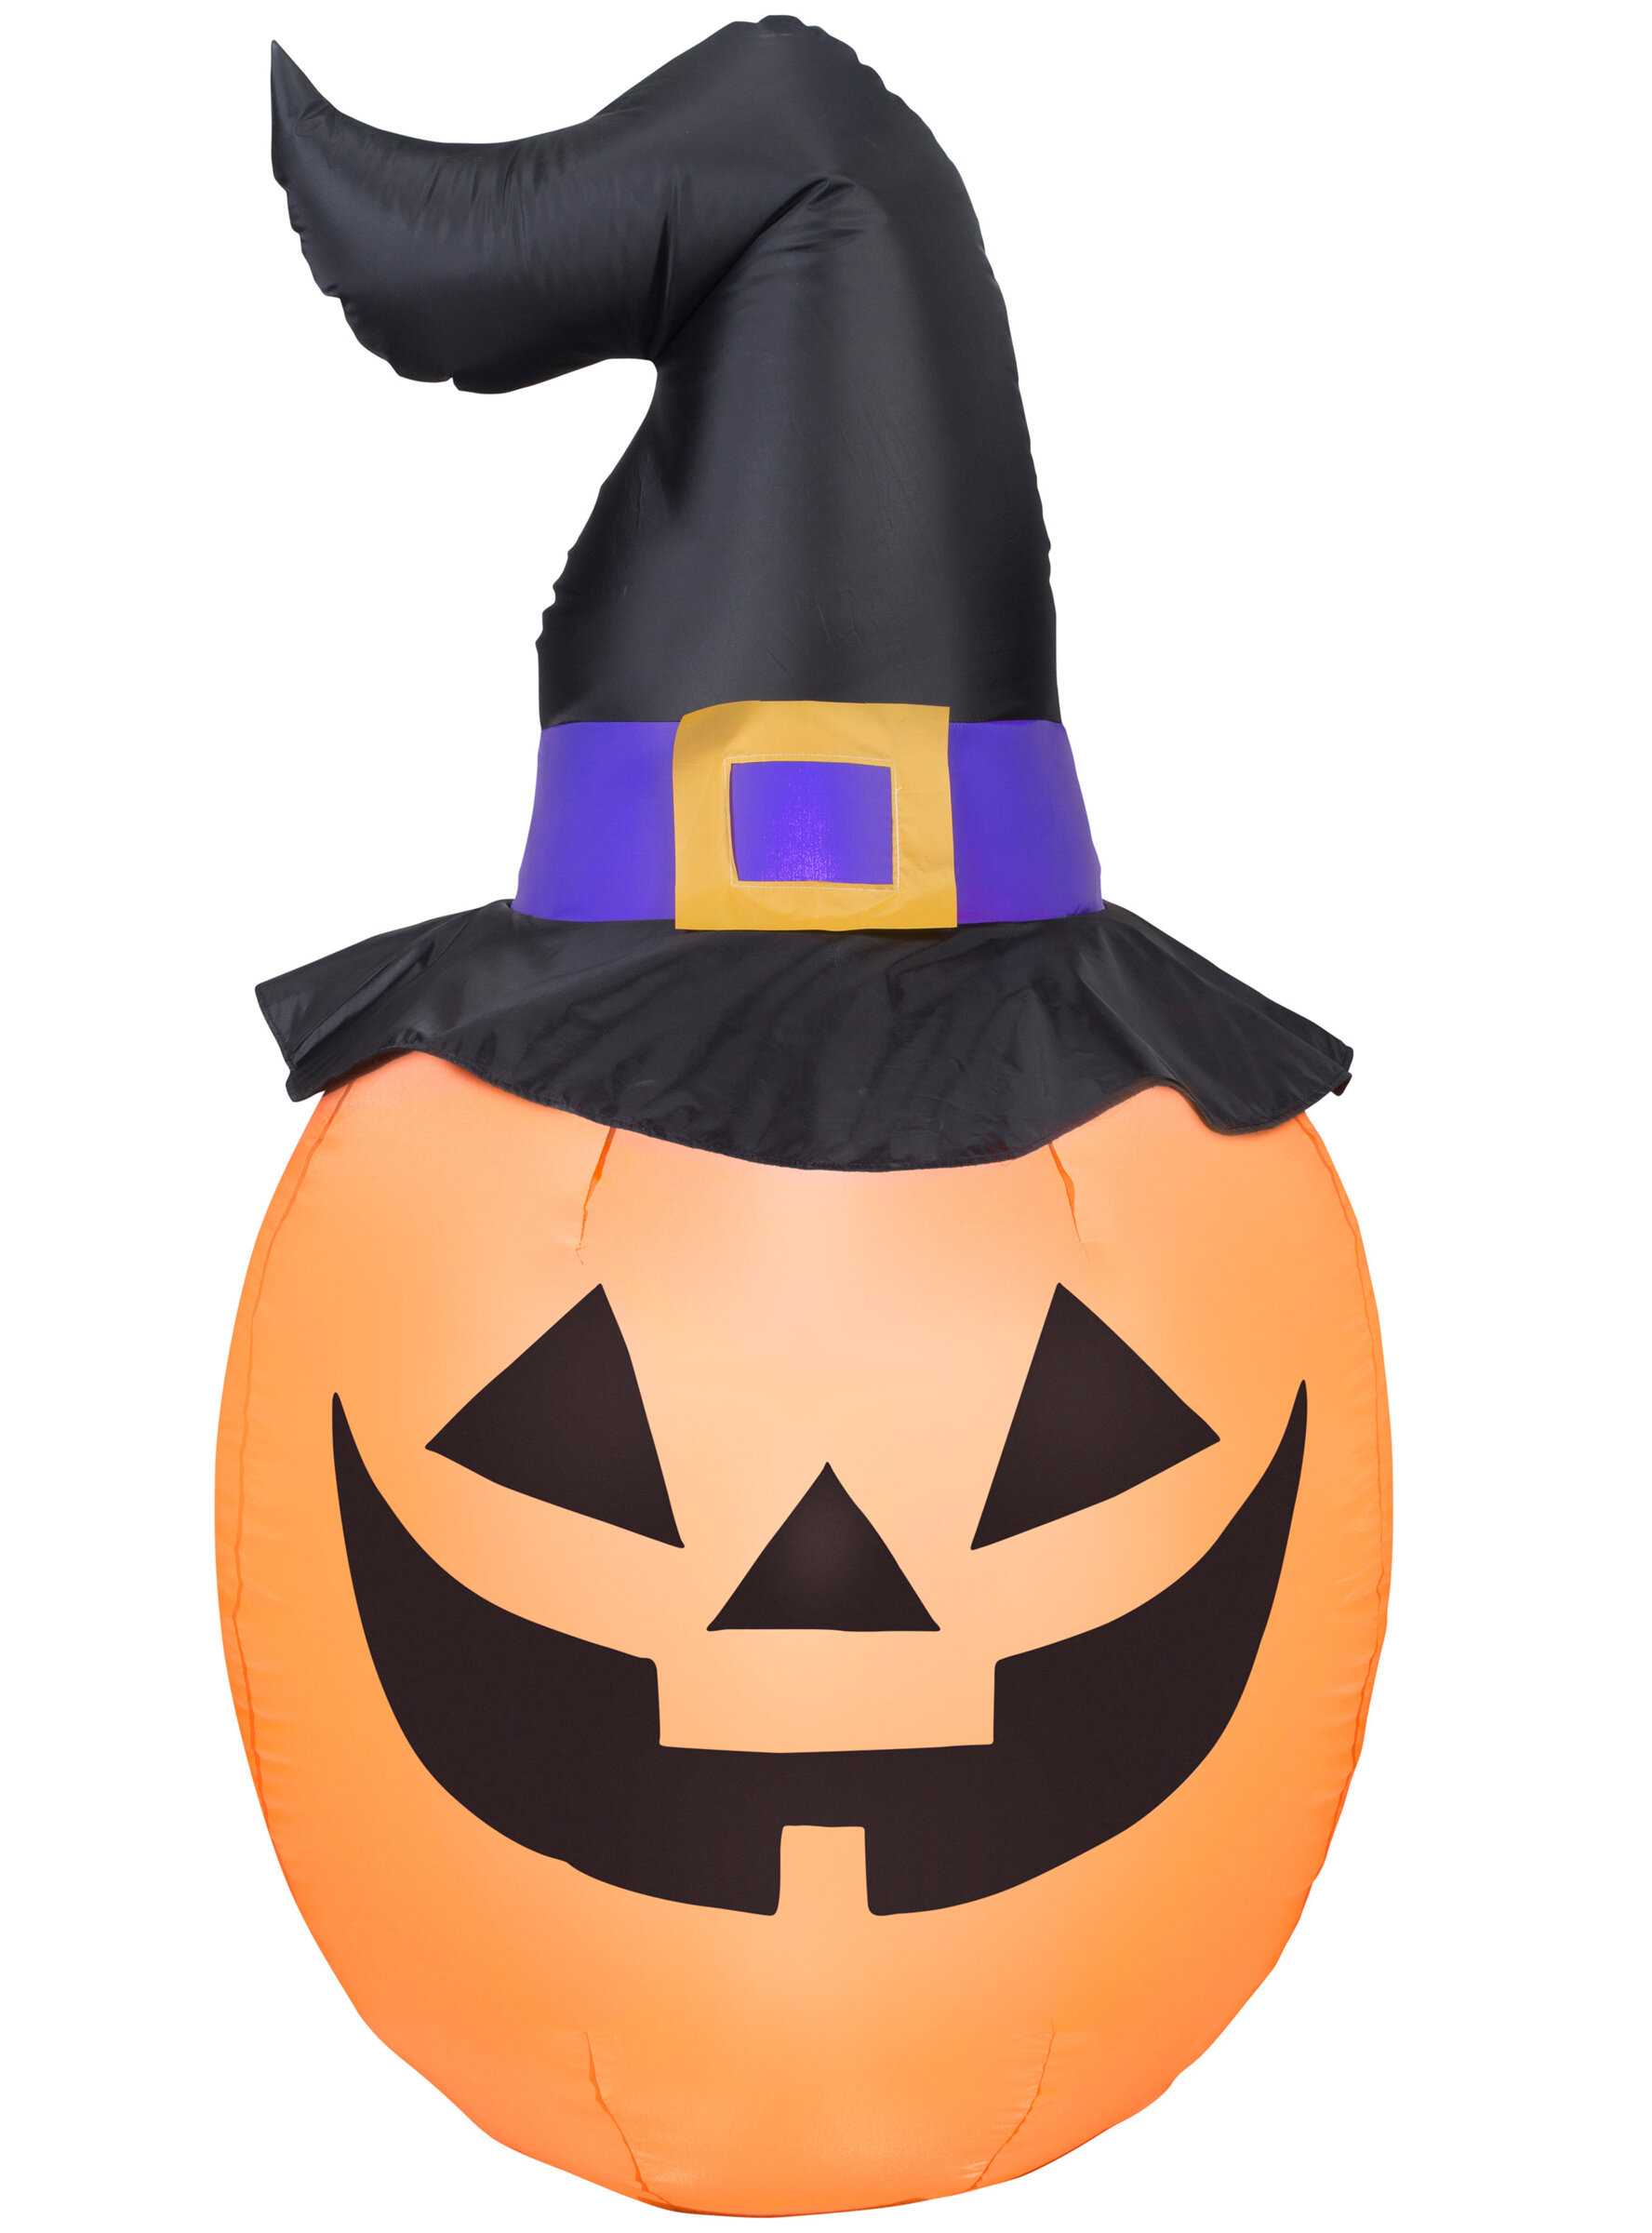 08302002a2e The Holiday Aisle Giant Jack-O-Lantern Inflatable